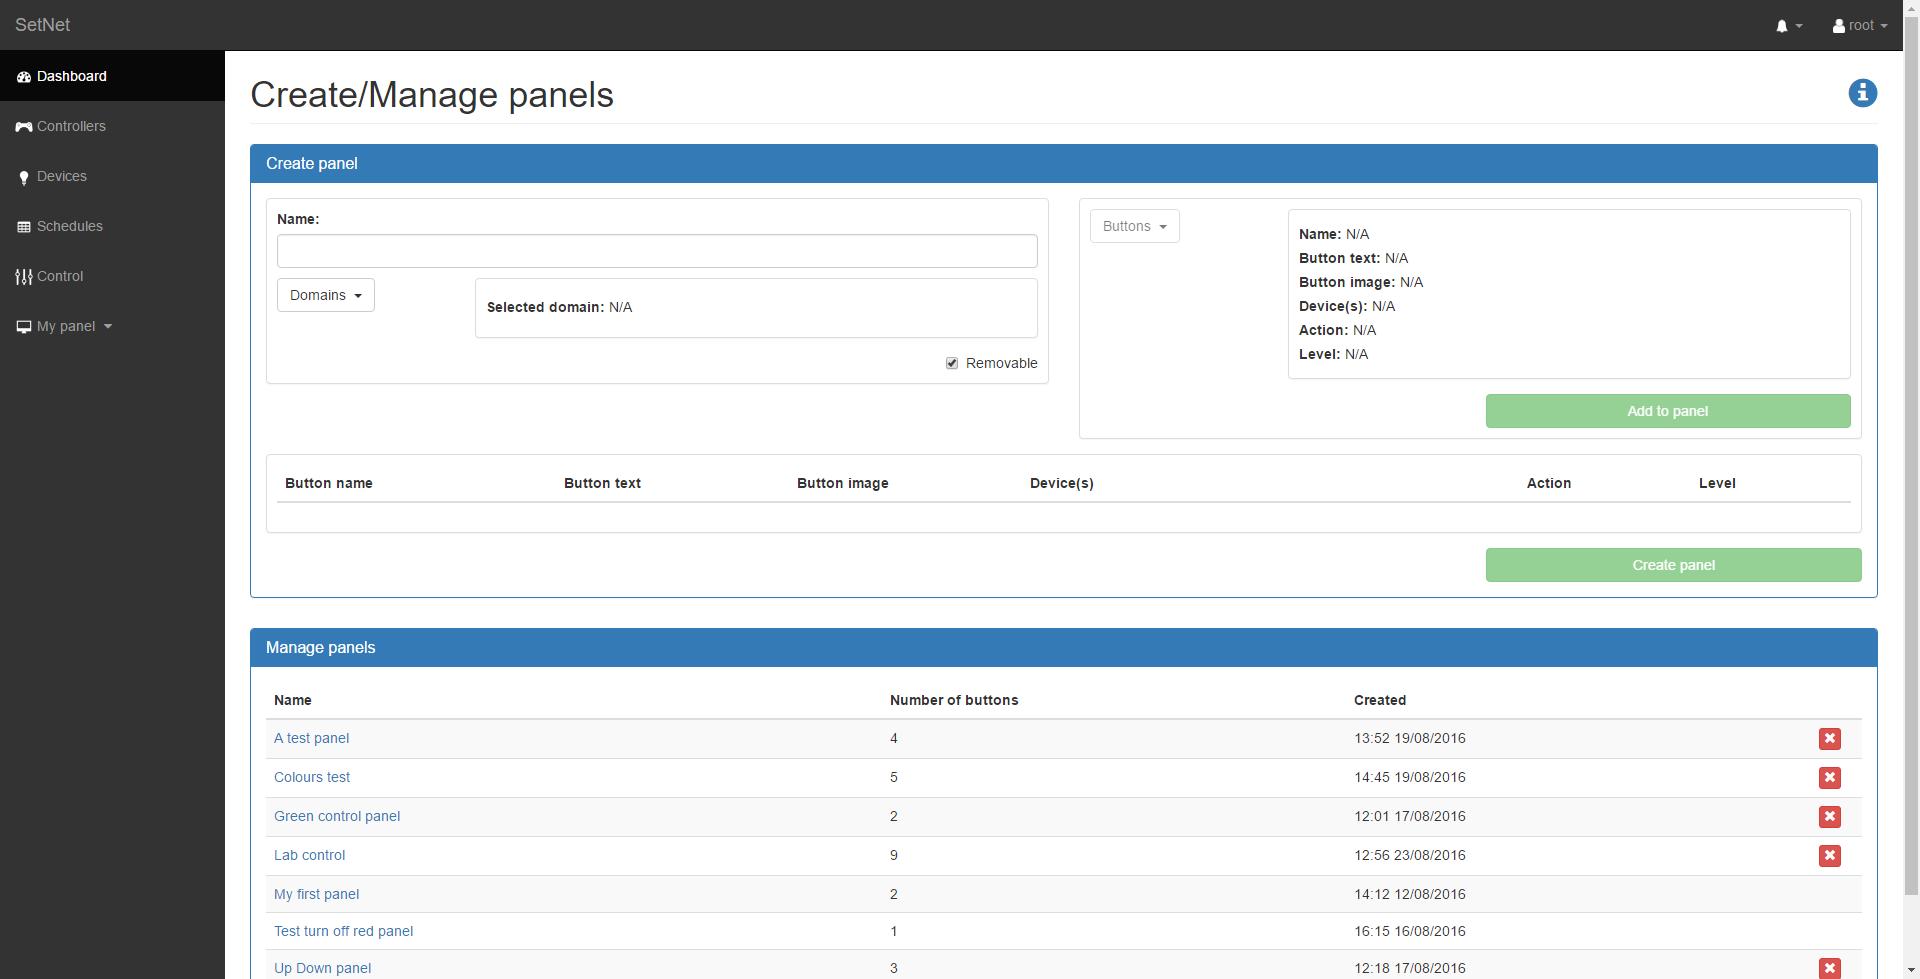 2016-08-24 13_35_32-SetNet _ Create_Manage panels.png